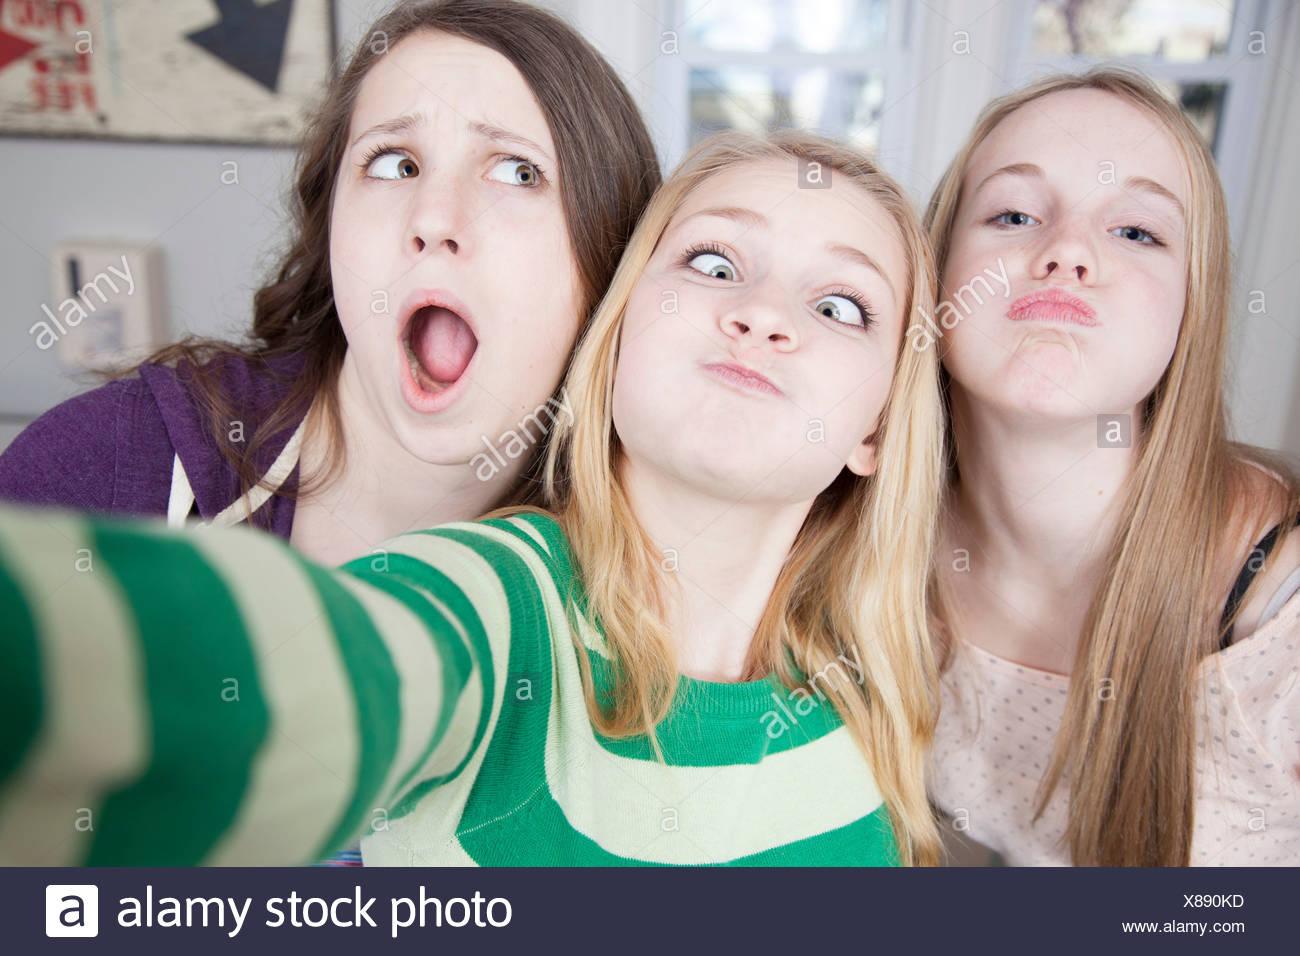 Les adolescents tirant funny faces Photo Stock